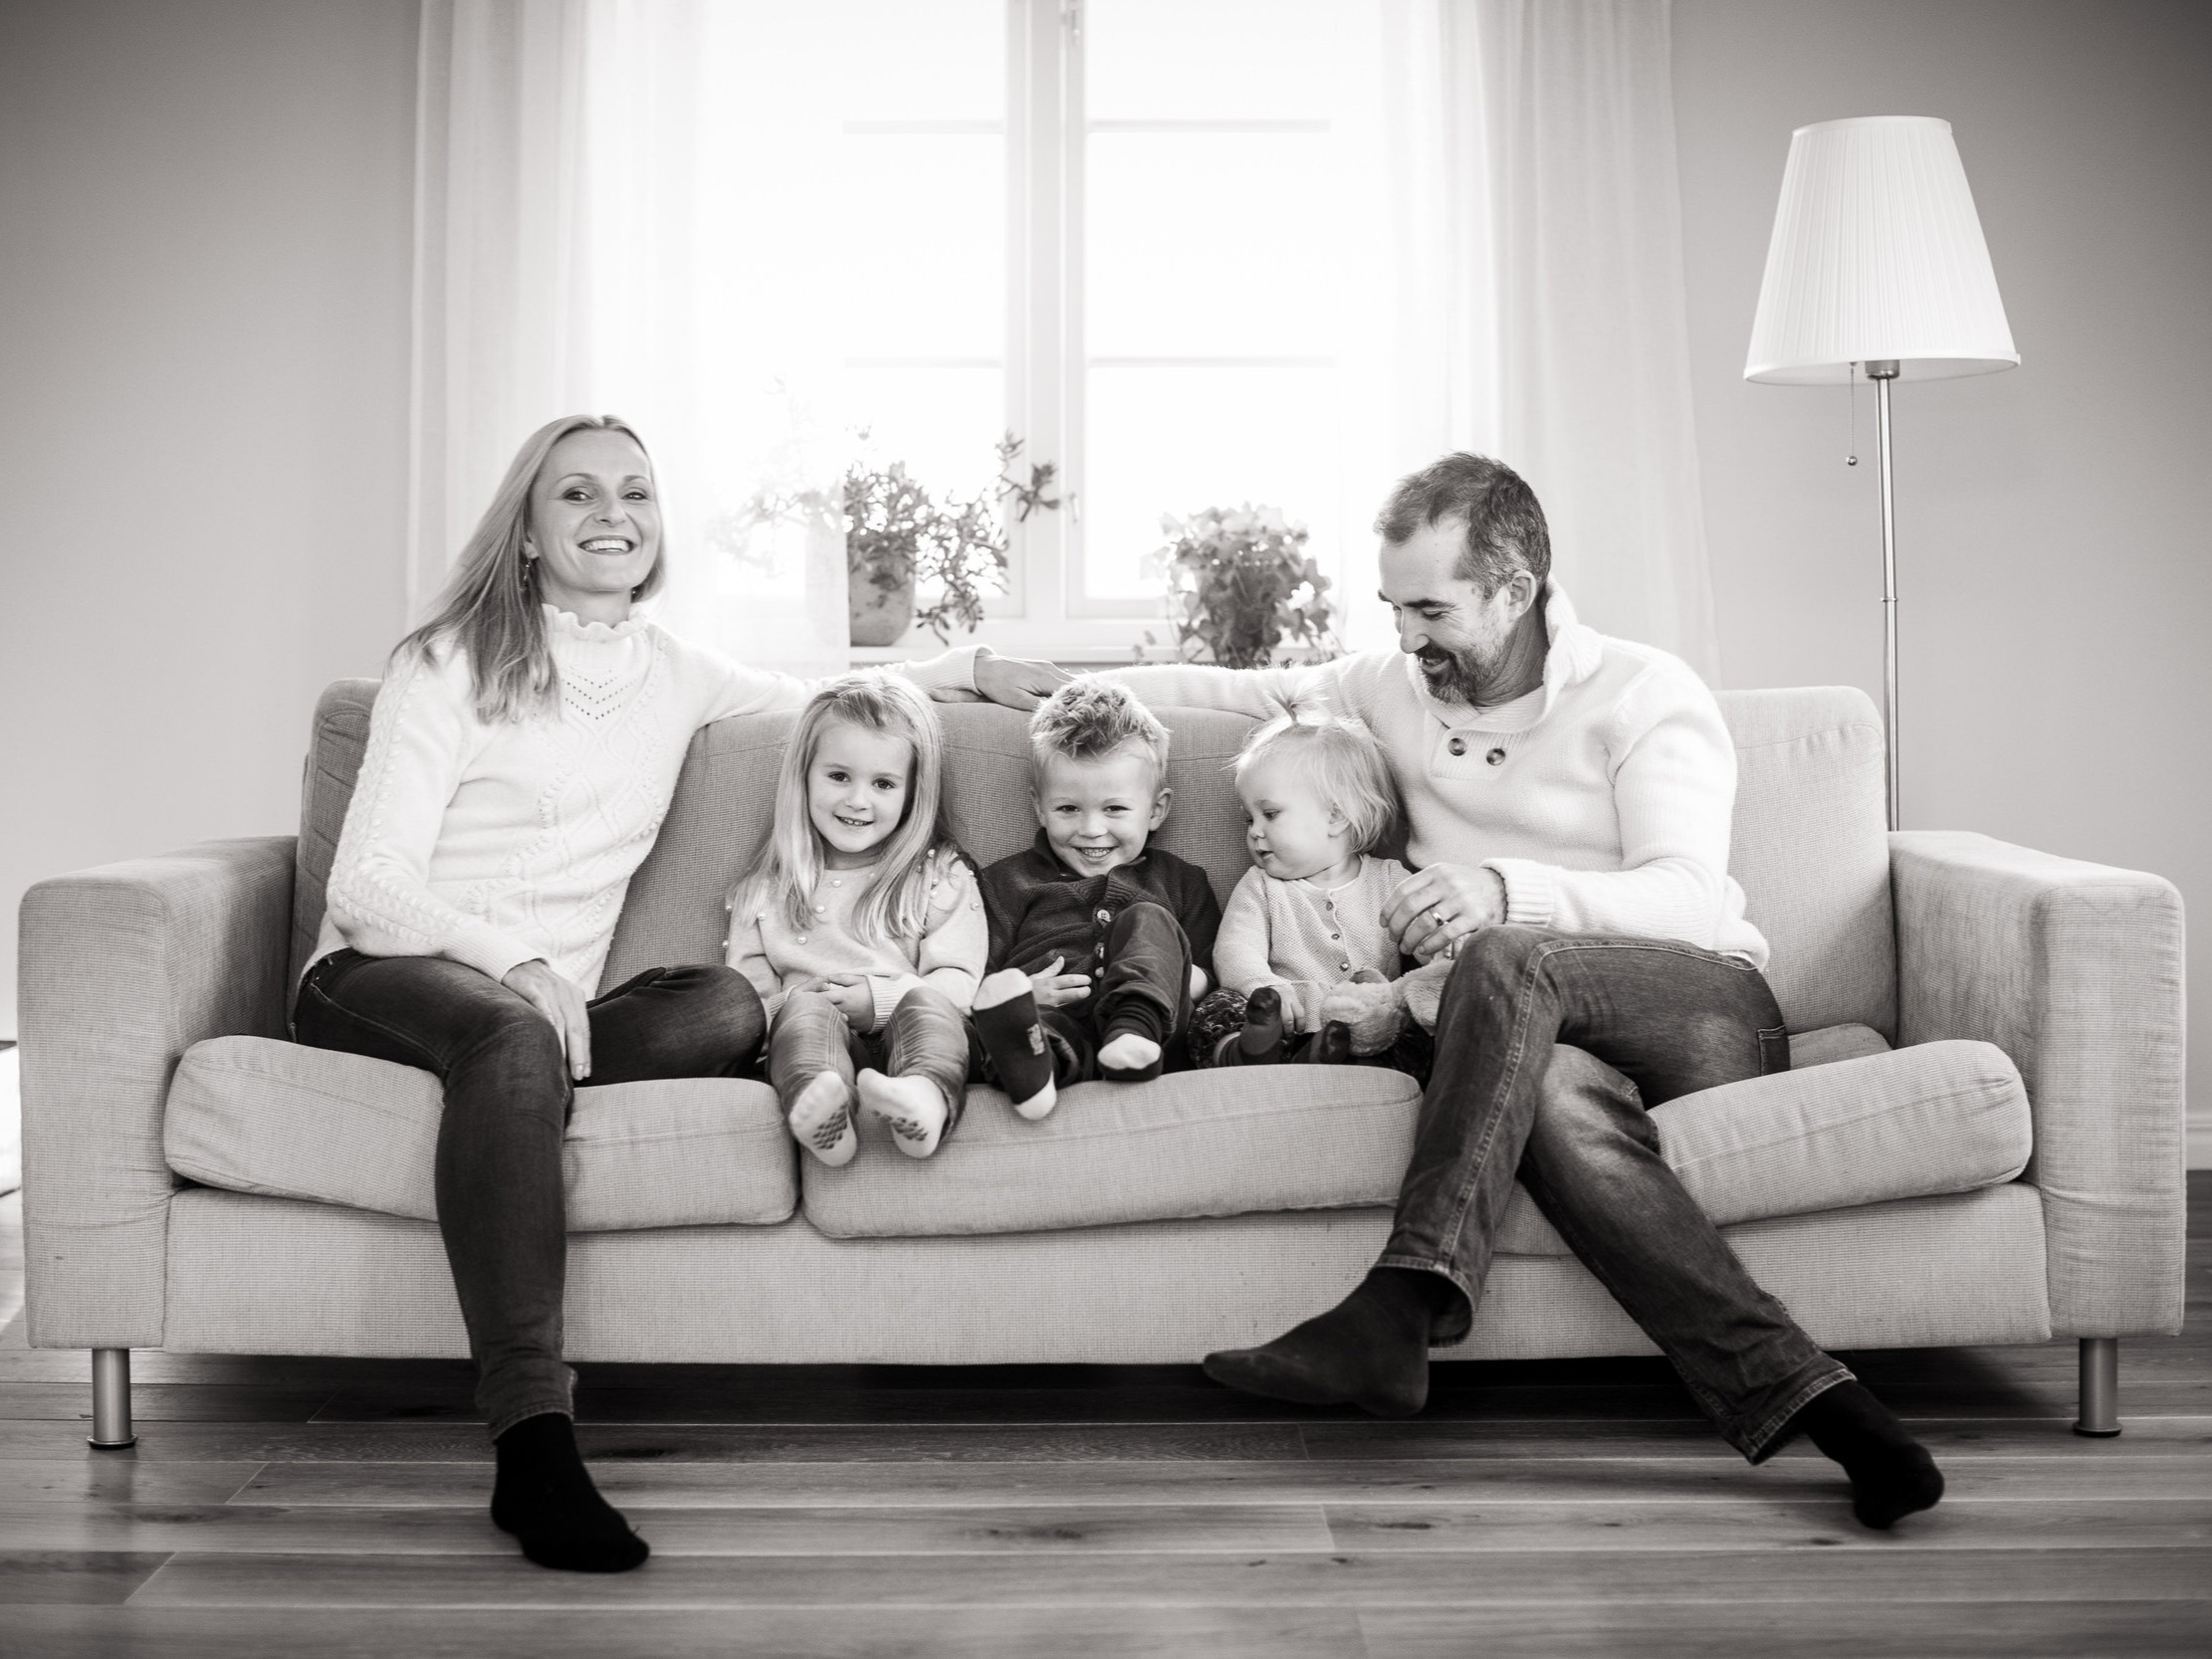 Family life hos familjen Werthén i Sollentuna, fotograferat en söndag i februari 2019.